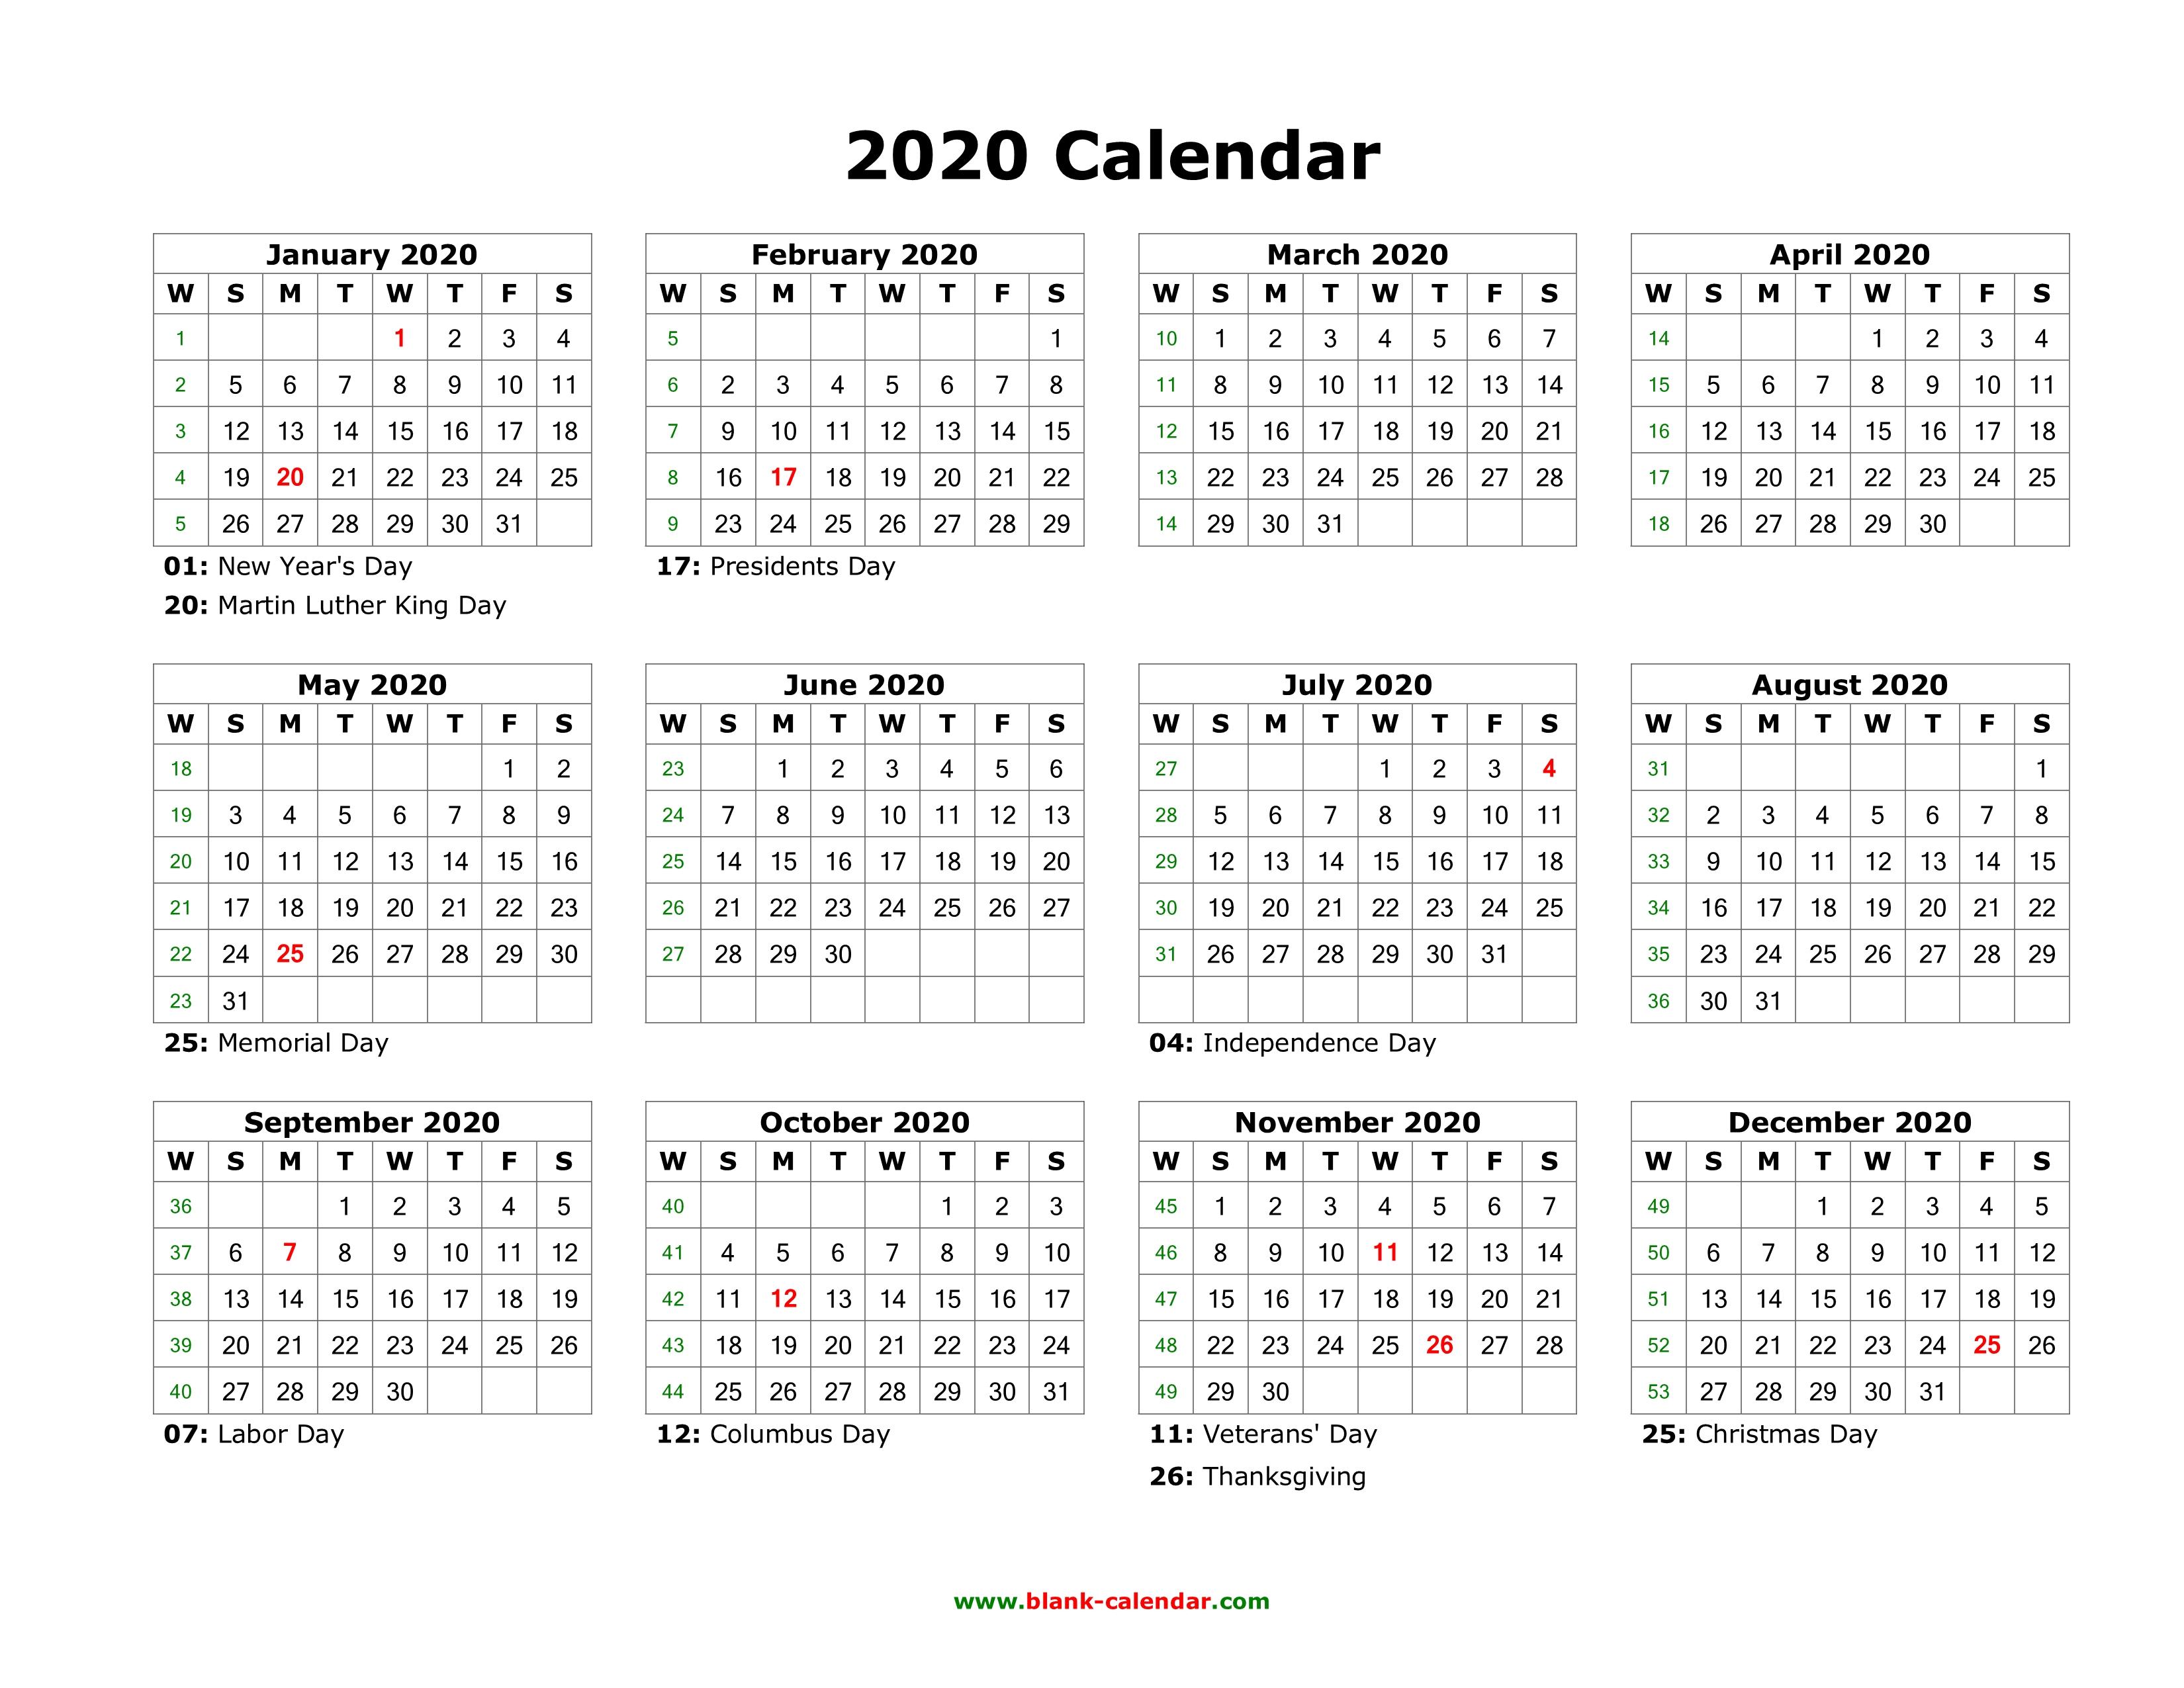 Blank Calendar 2020 | Free Download Calendar Templates